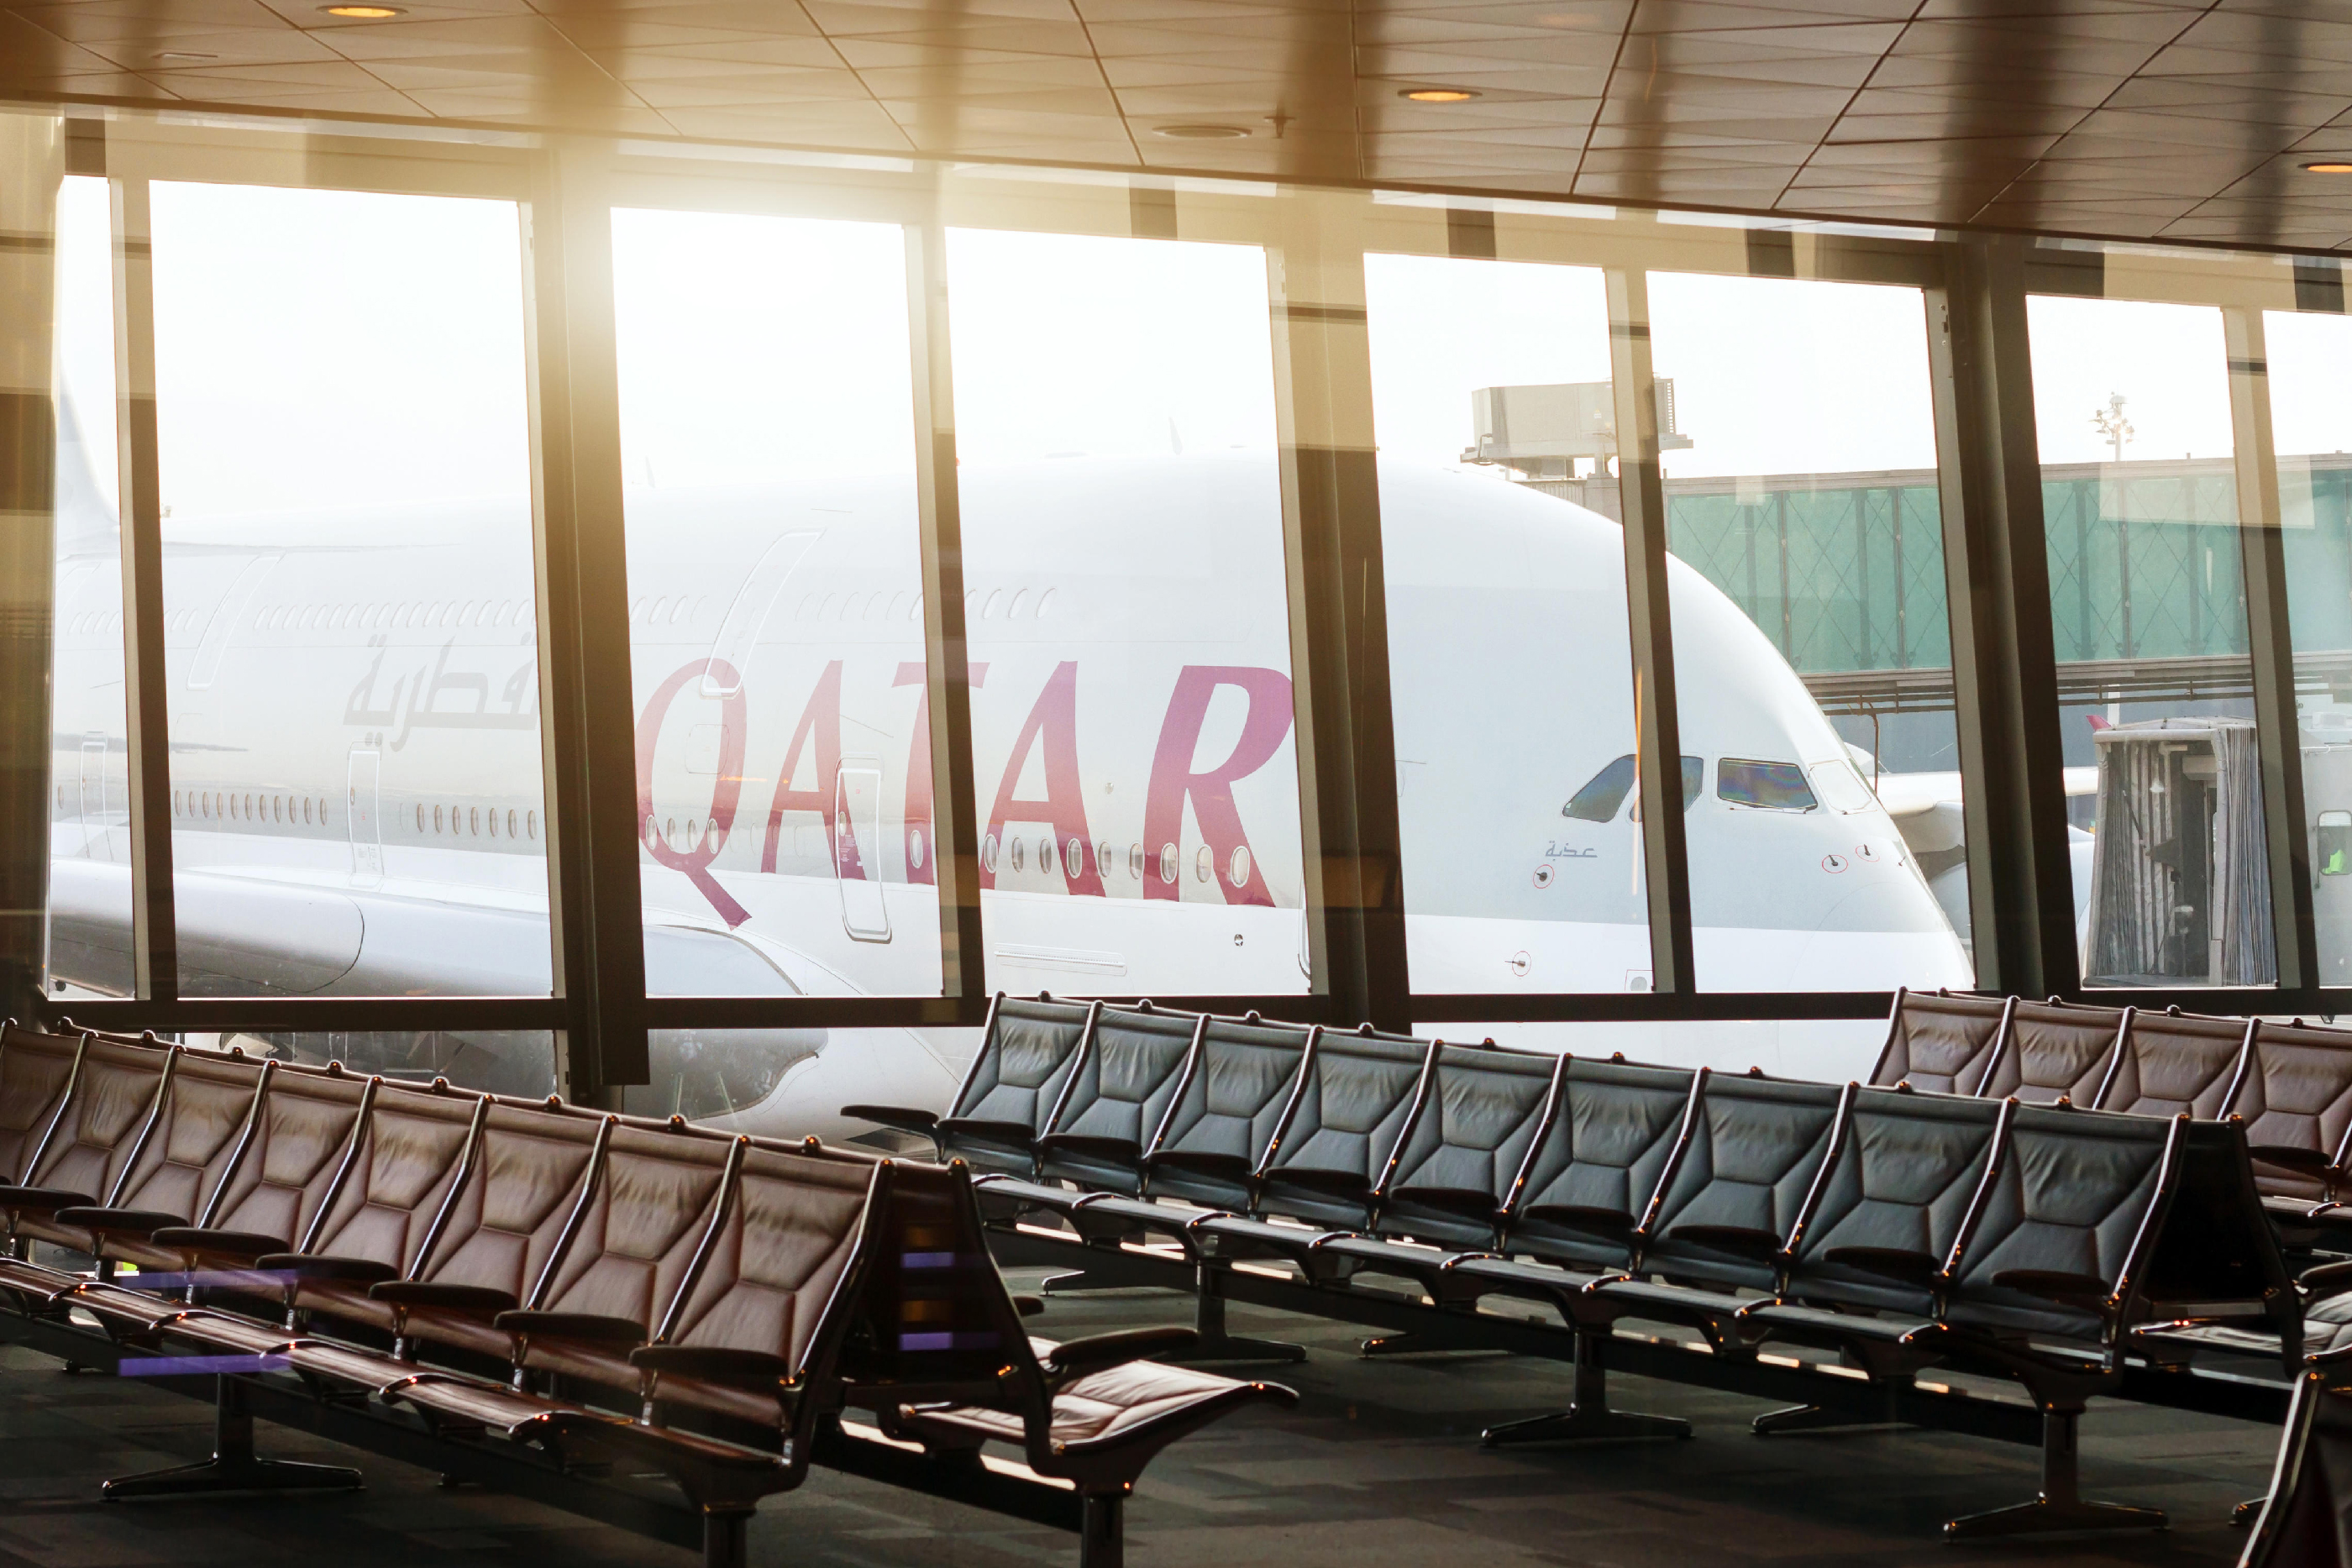 DOHA, QATAR - APRIL 25 2017: Airplane of Qatar airways in the international airport of Doha